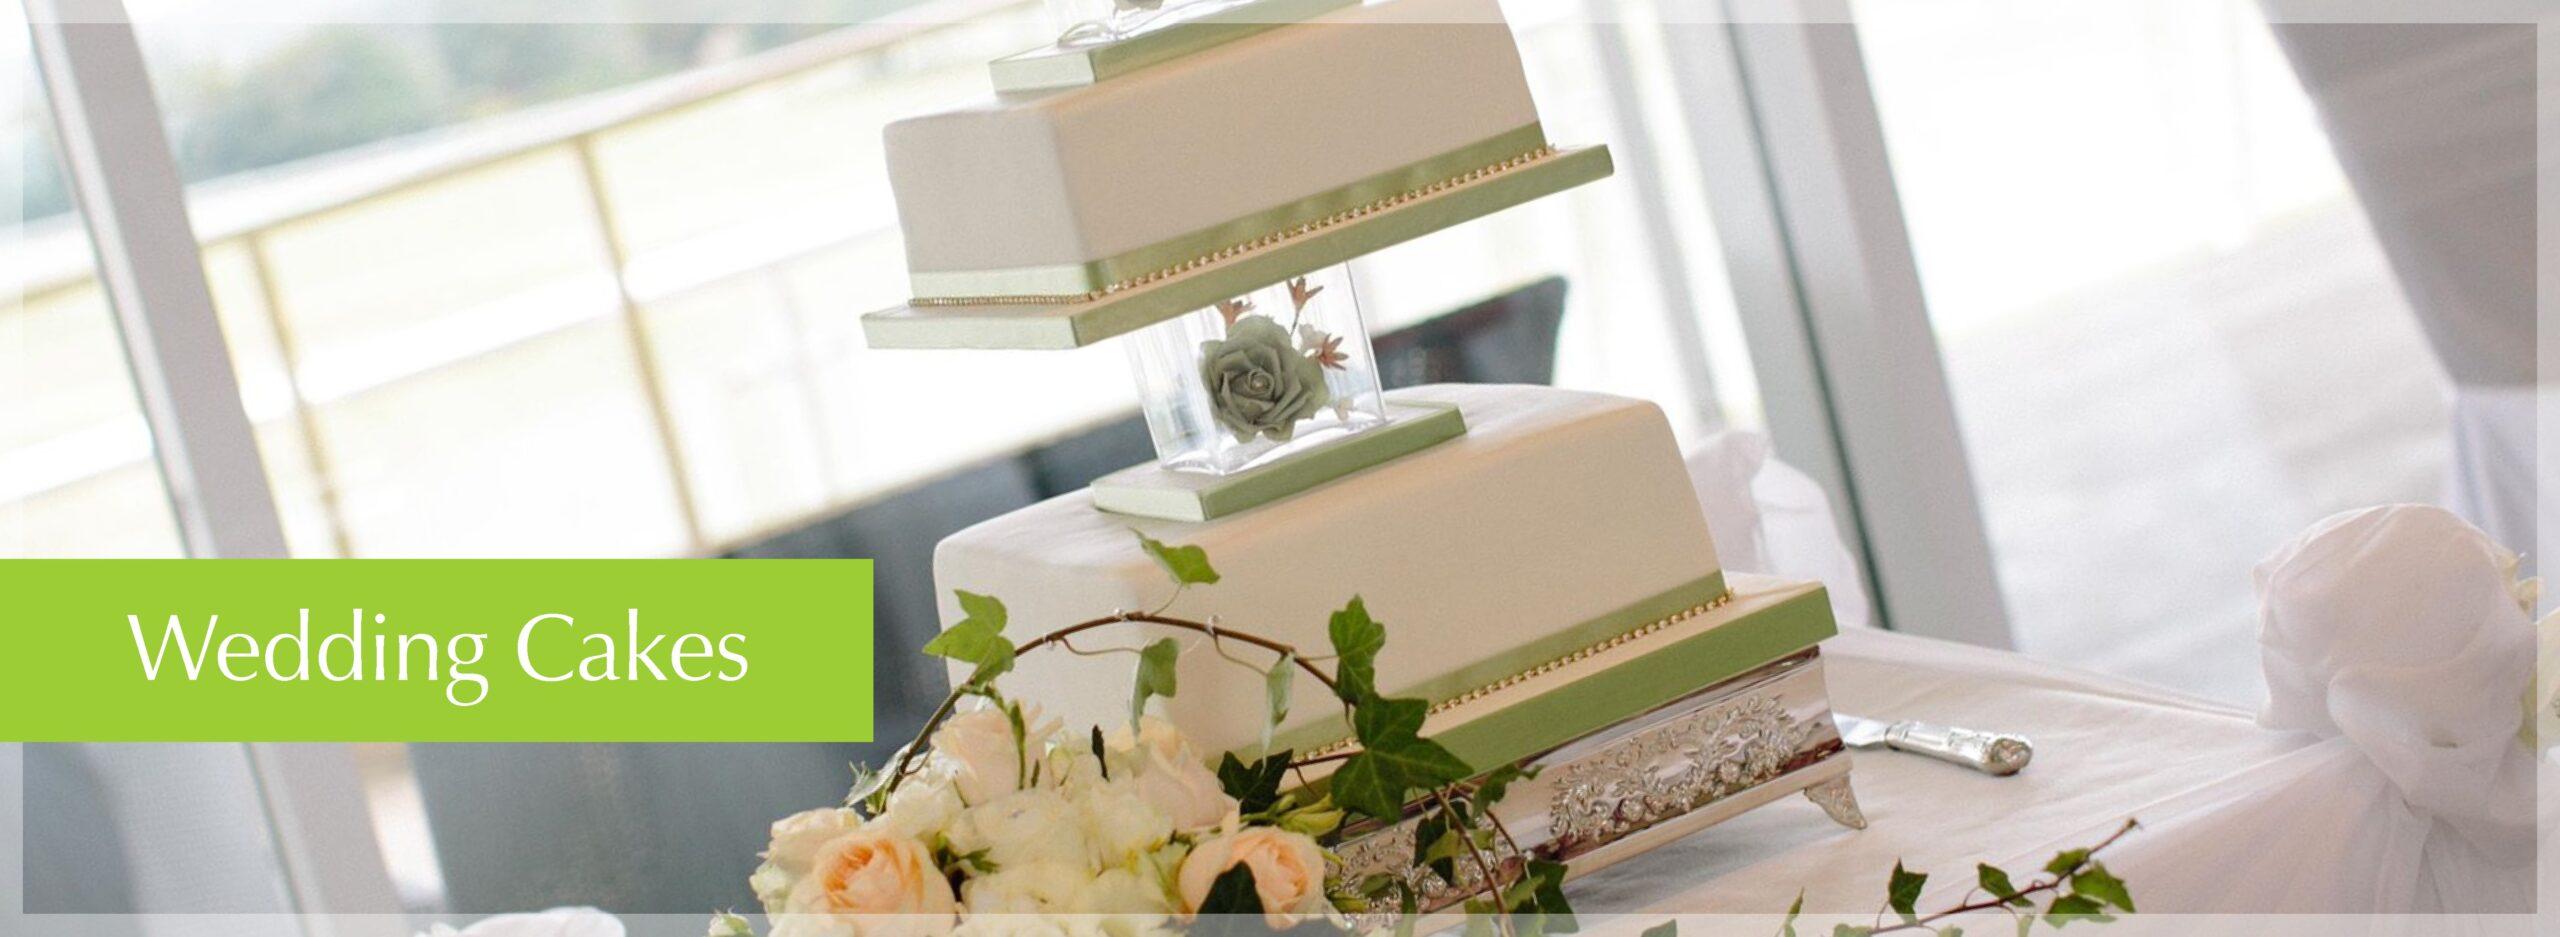 wedding cakes photo header new